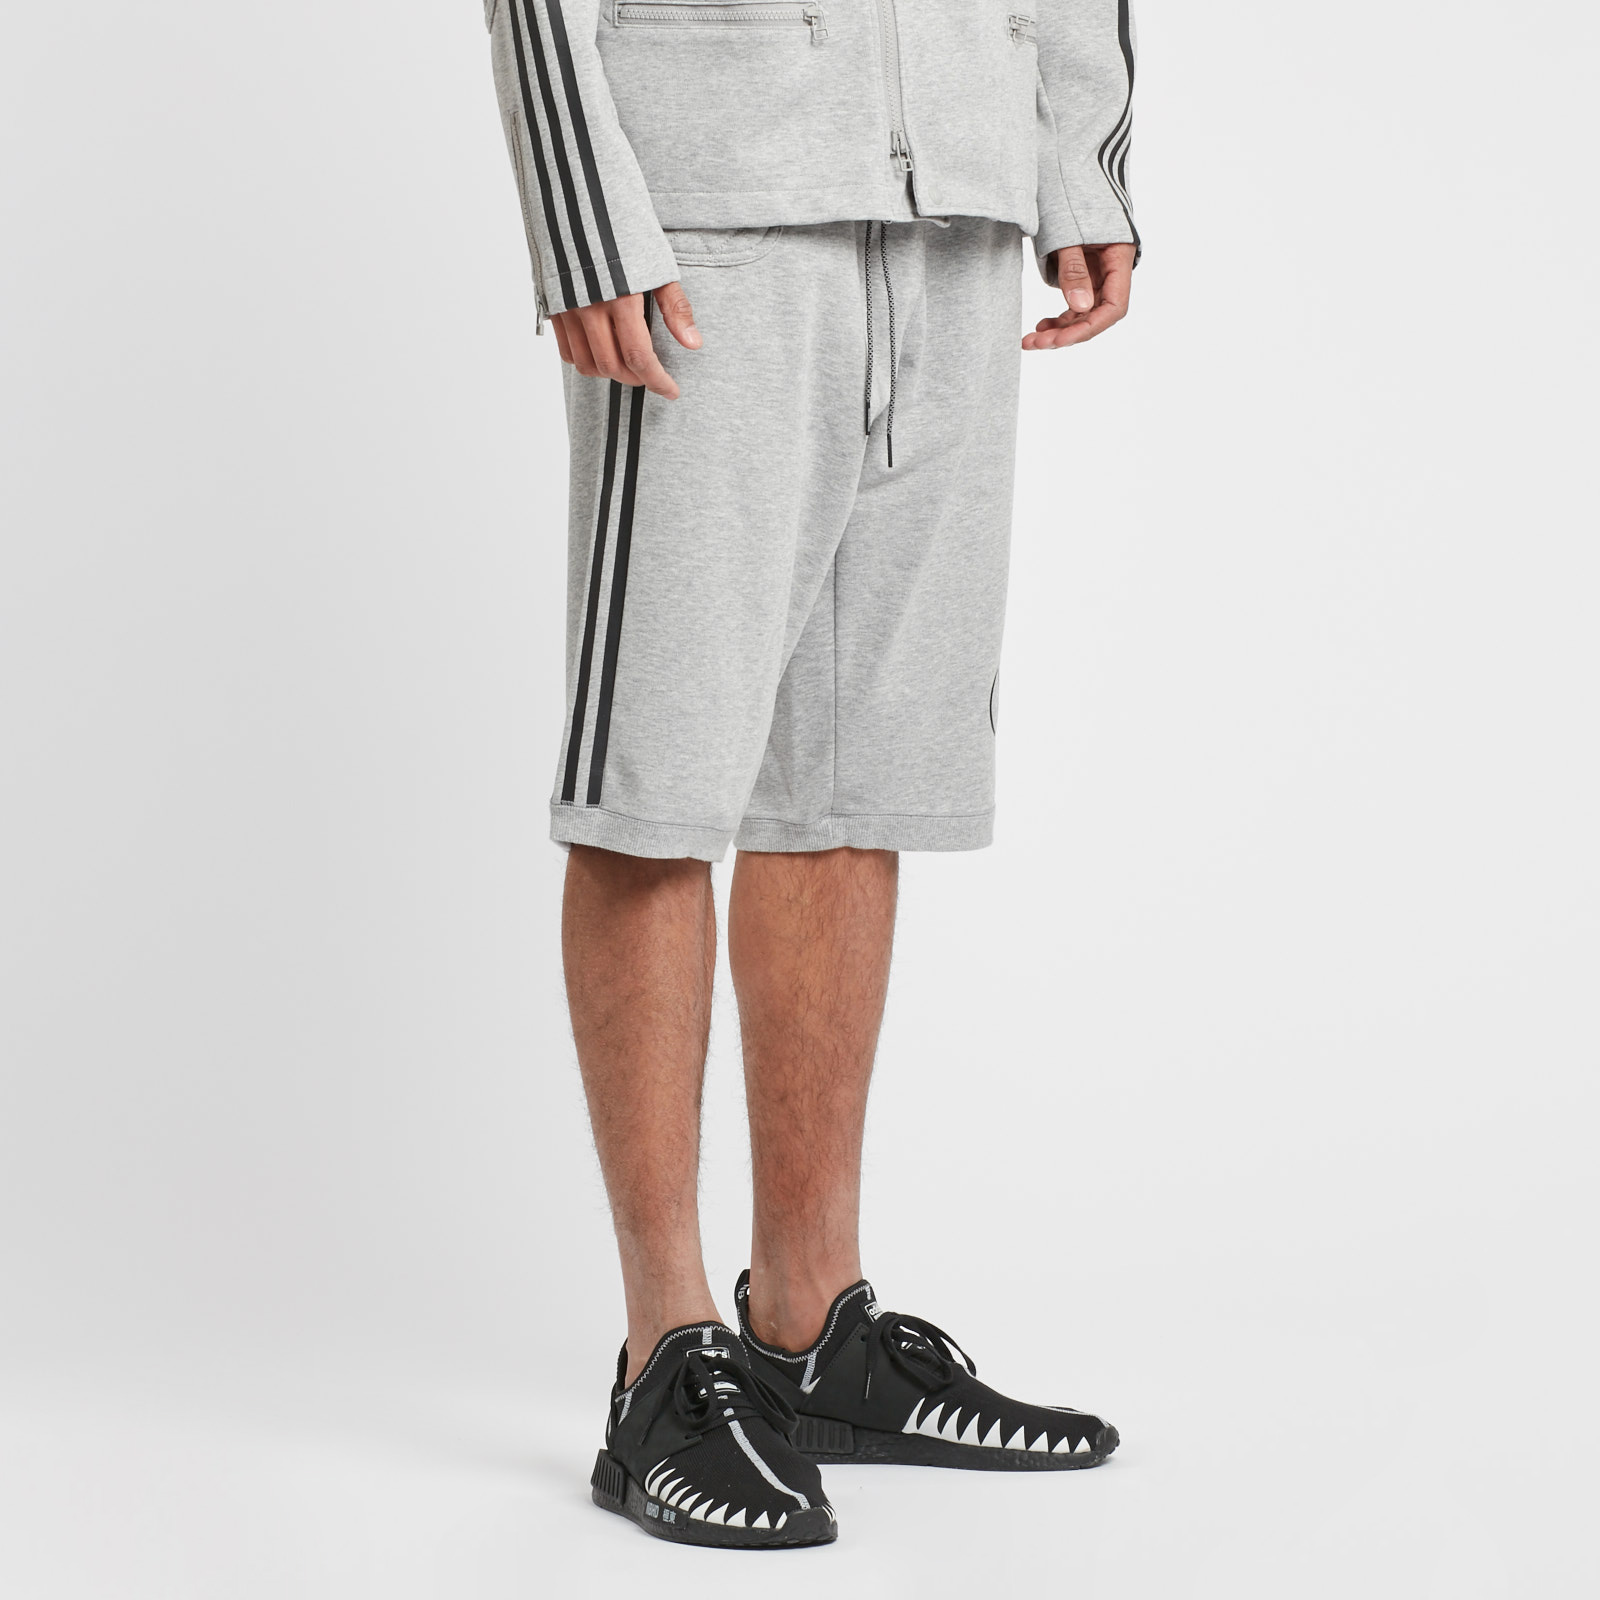 Adidas x Neighborhood: Riders Track Jacket [Grey]